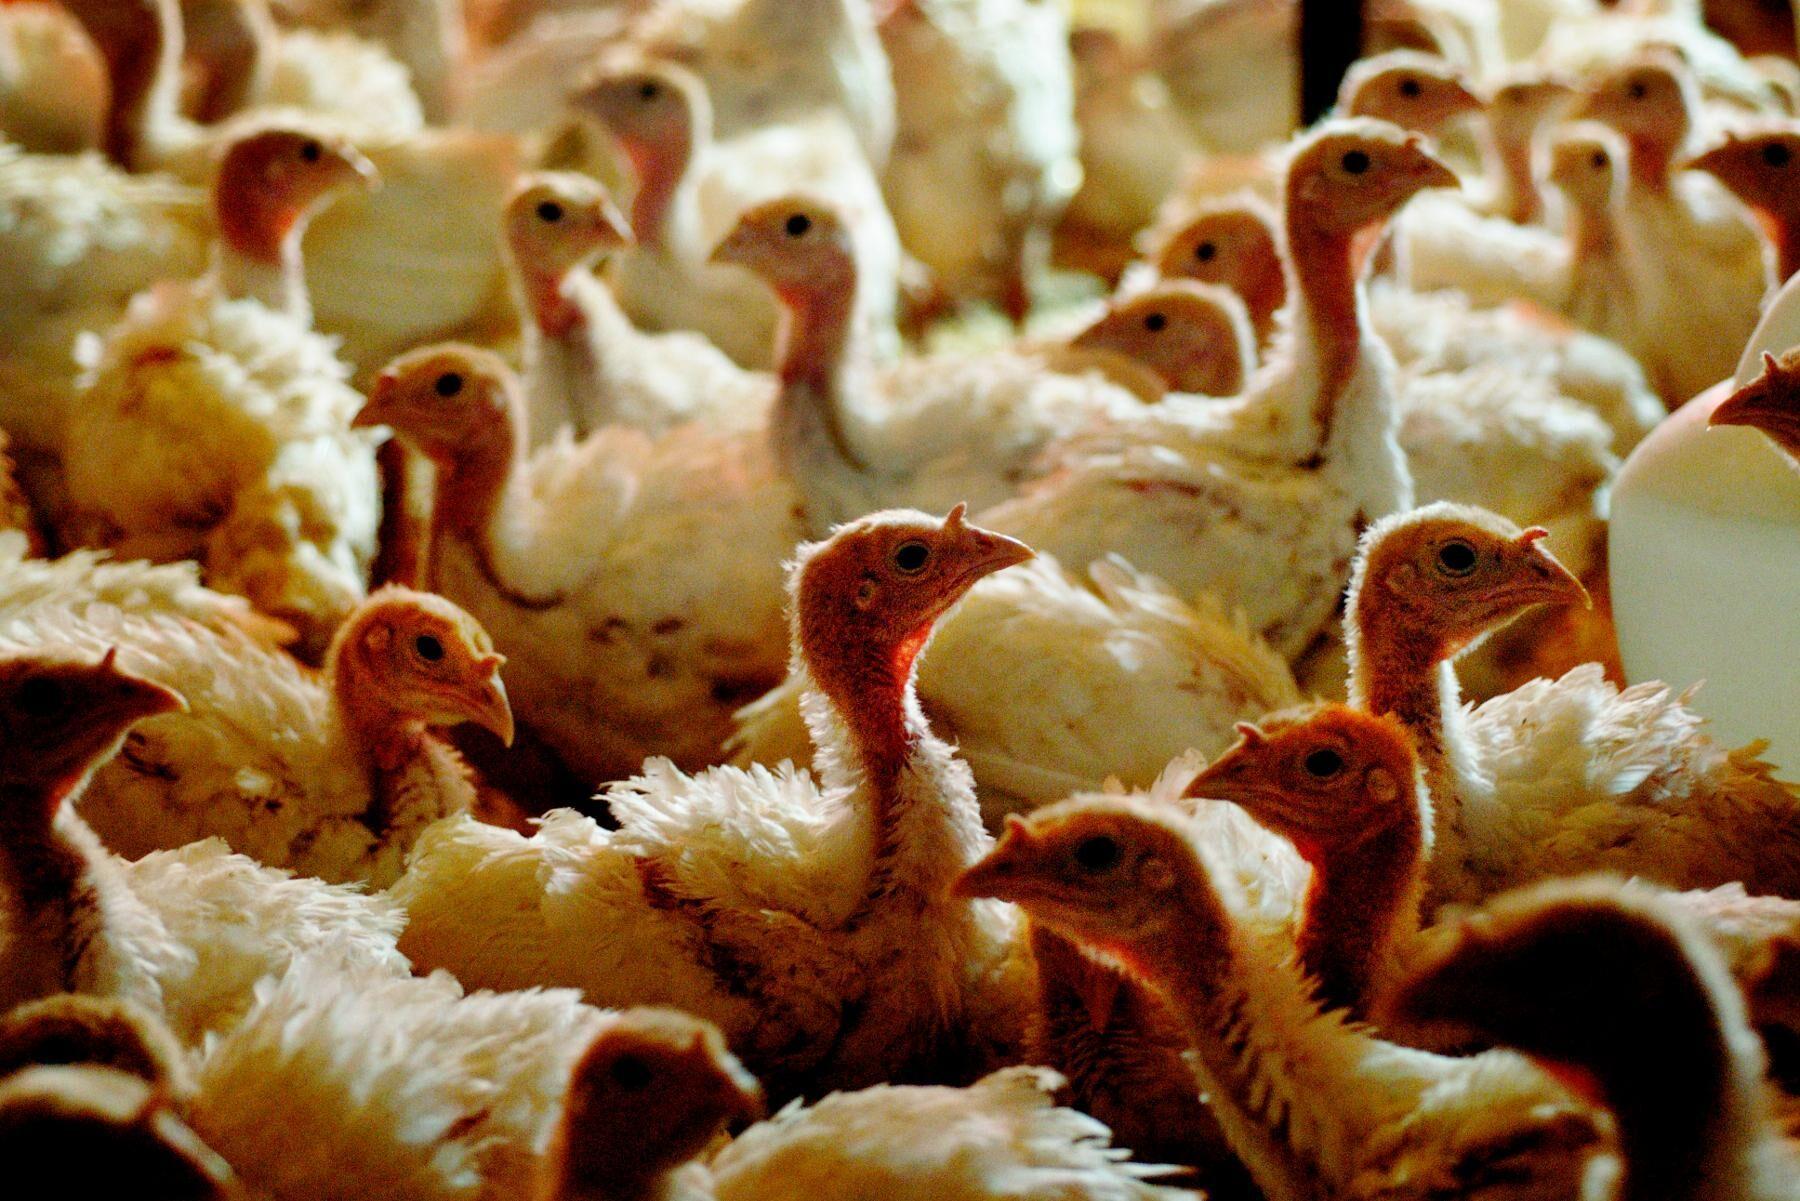 Ett nytt utbrott av fågelinfluensa i Skåne har tvingat fram en nödslakt. Arkivbild.